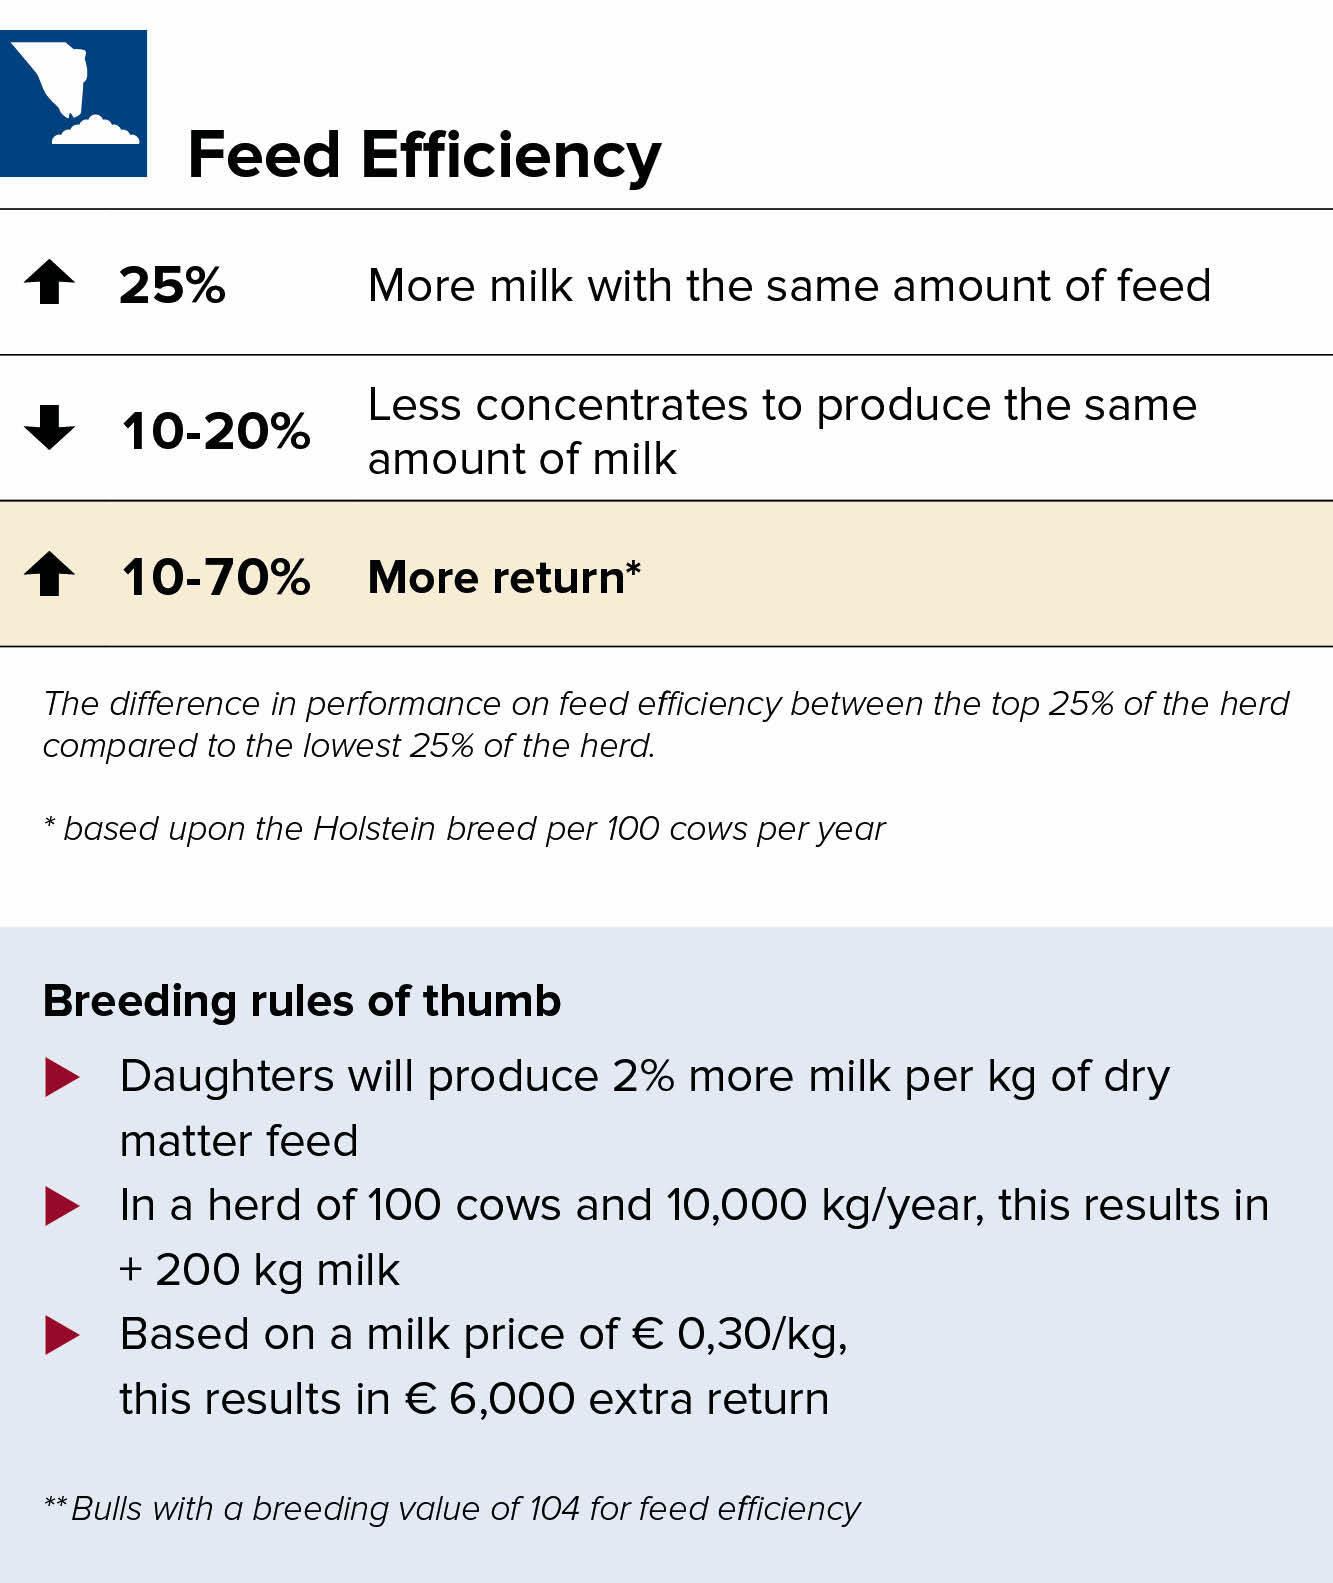 Feed efficiency breeding value